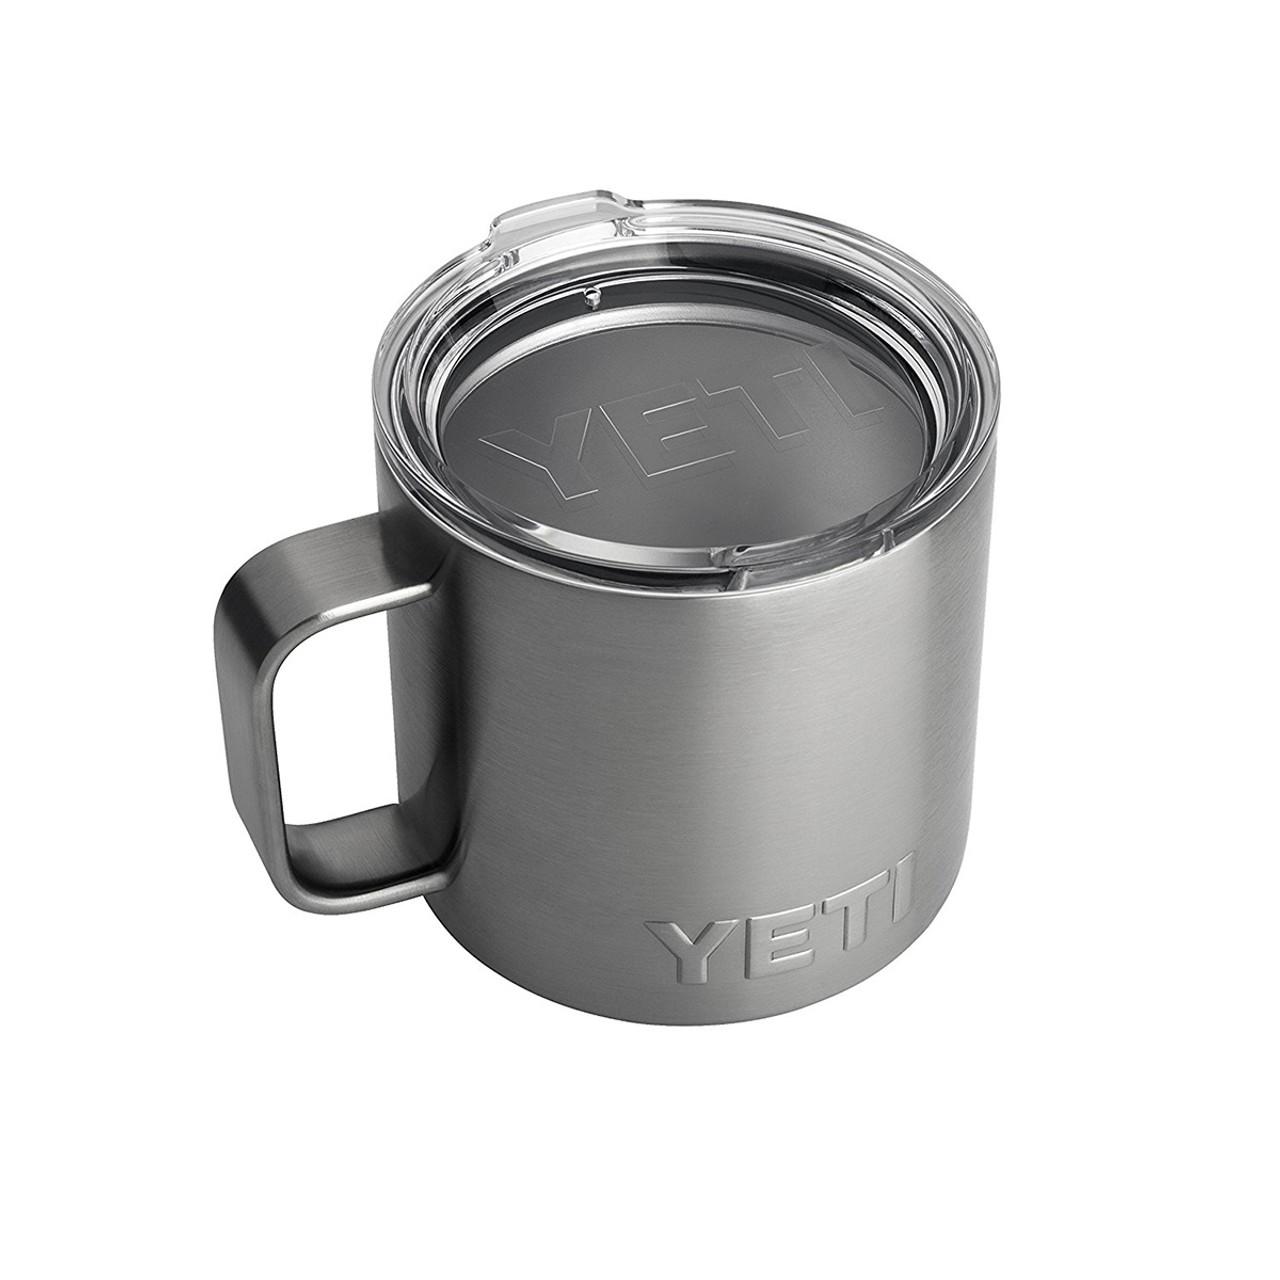 ba353008cb2 YETI Rambler 14 oz Stainless Steel Vacuum Insulated Tumbler Mug With Lid